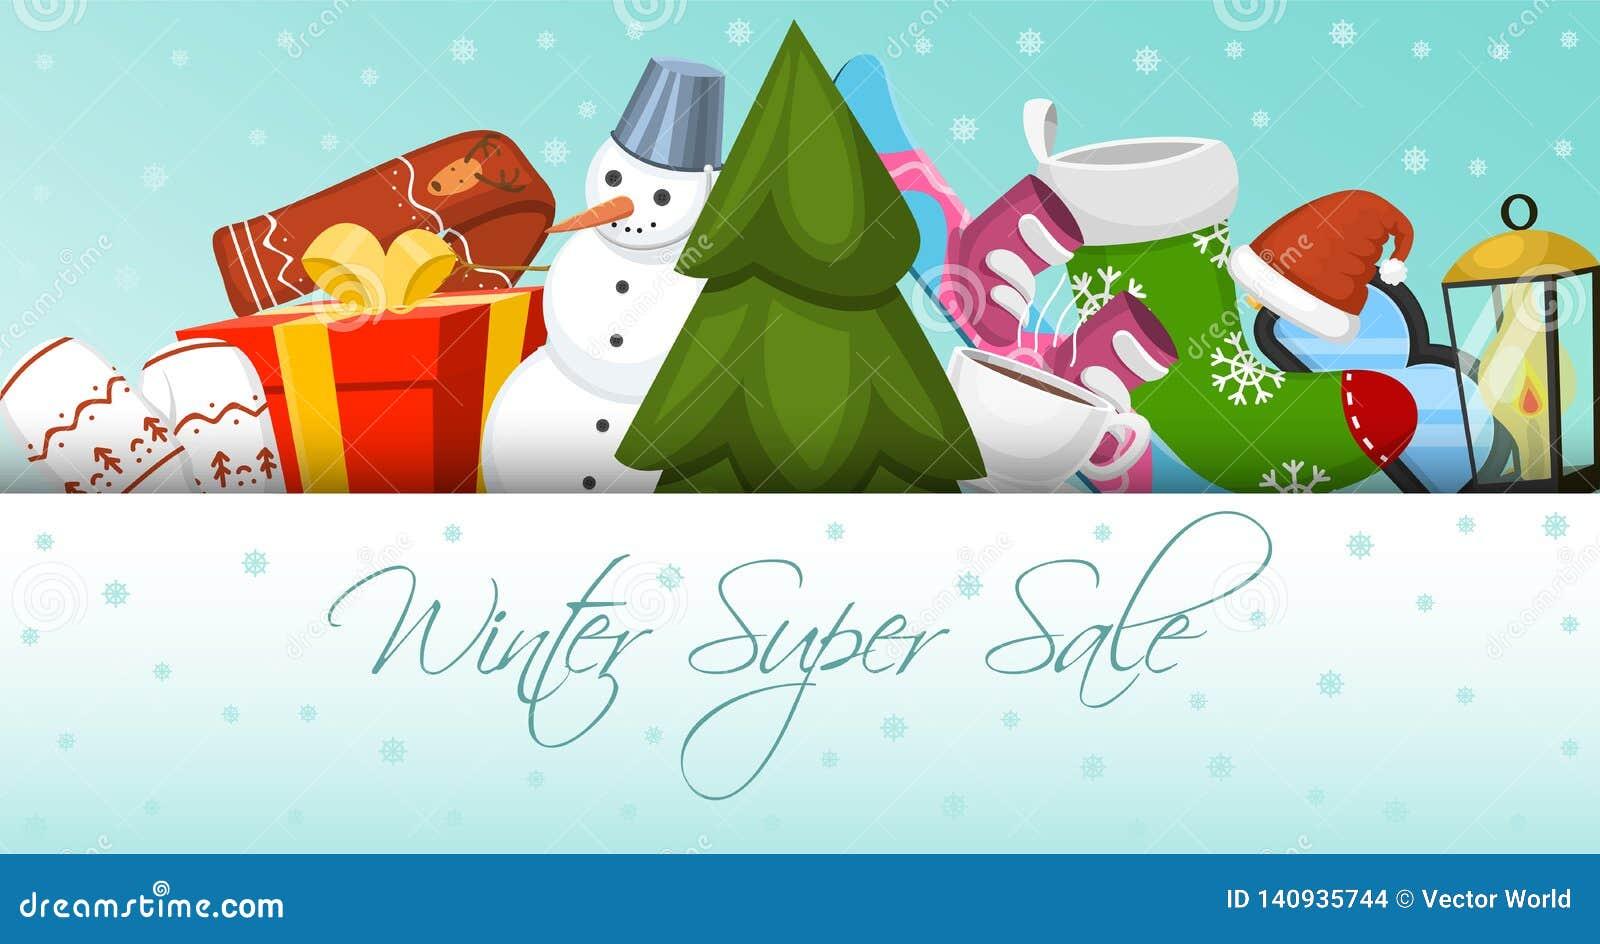 Winter super sale banner vector illustration. Nature landscape with Christmas tree, snowmen, sledge, snowboard, hat